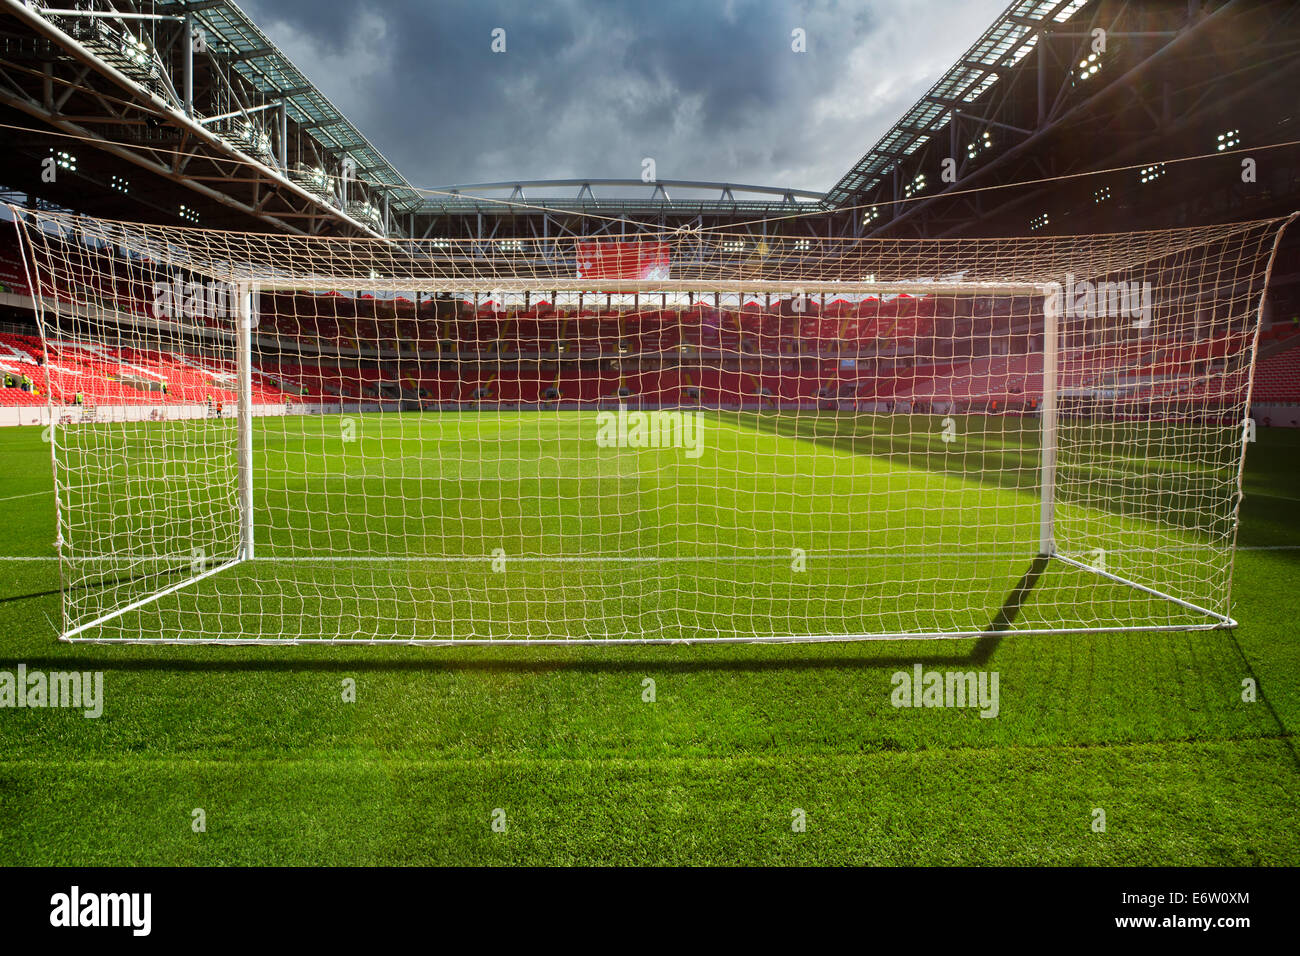 Moscow, Russia. 30th Aug, 2014. Moscow Opens World Cup 2018 Stadium - Otkrytie Arena Credit:  Nikolay Vinokurov/Alamy - Stock Image